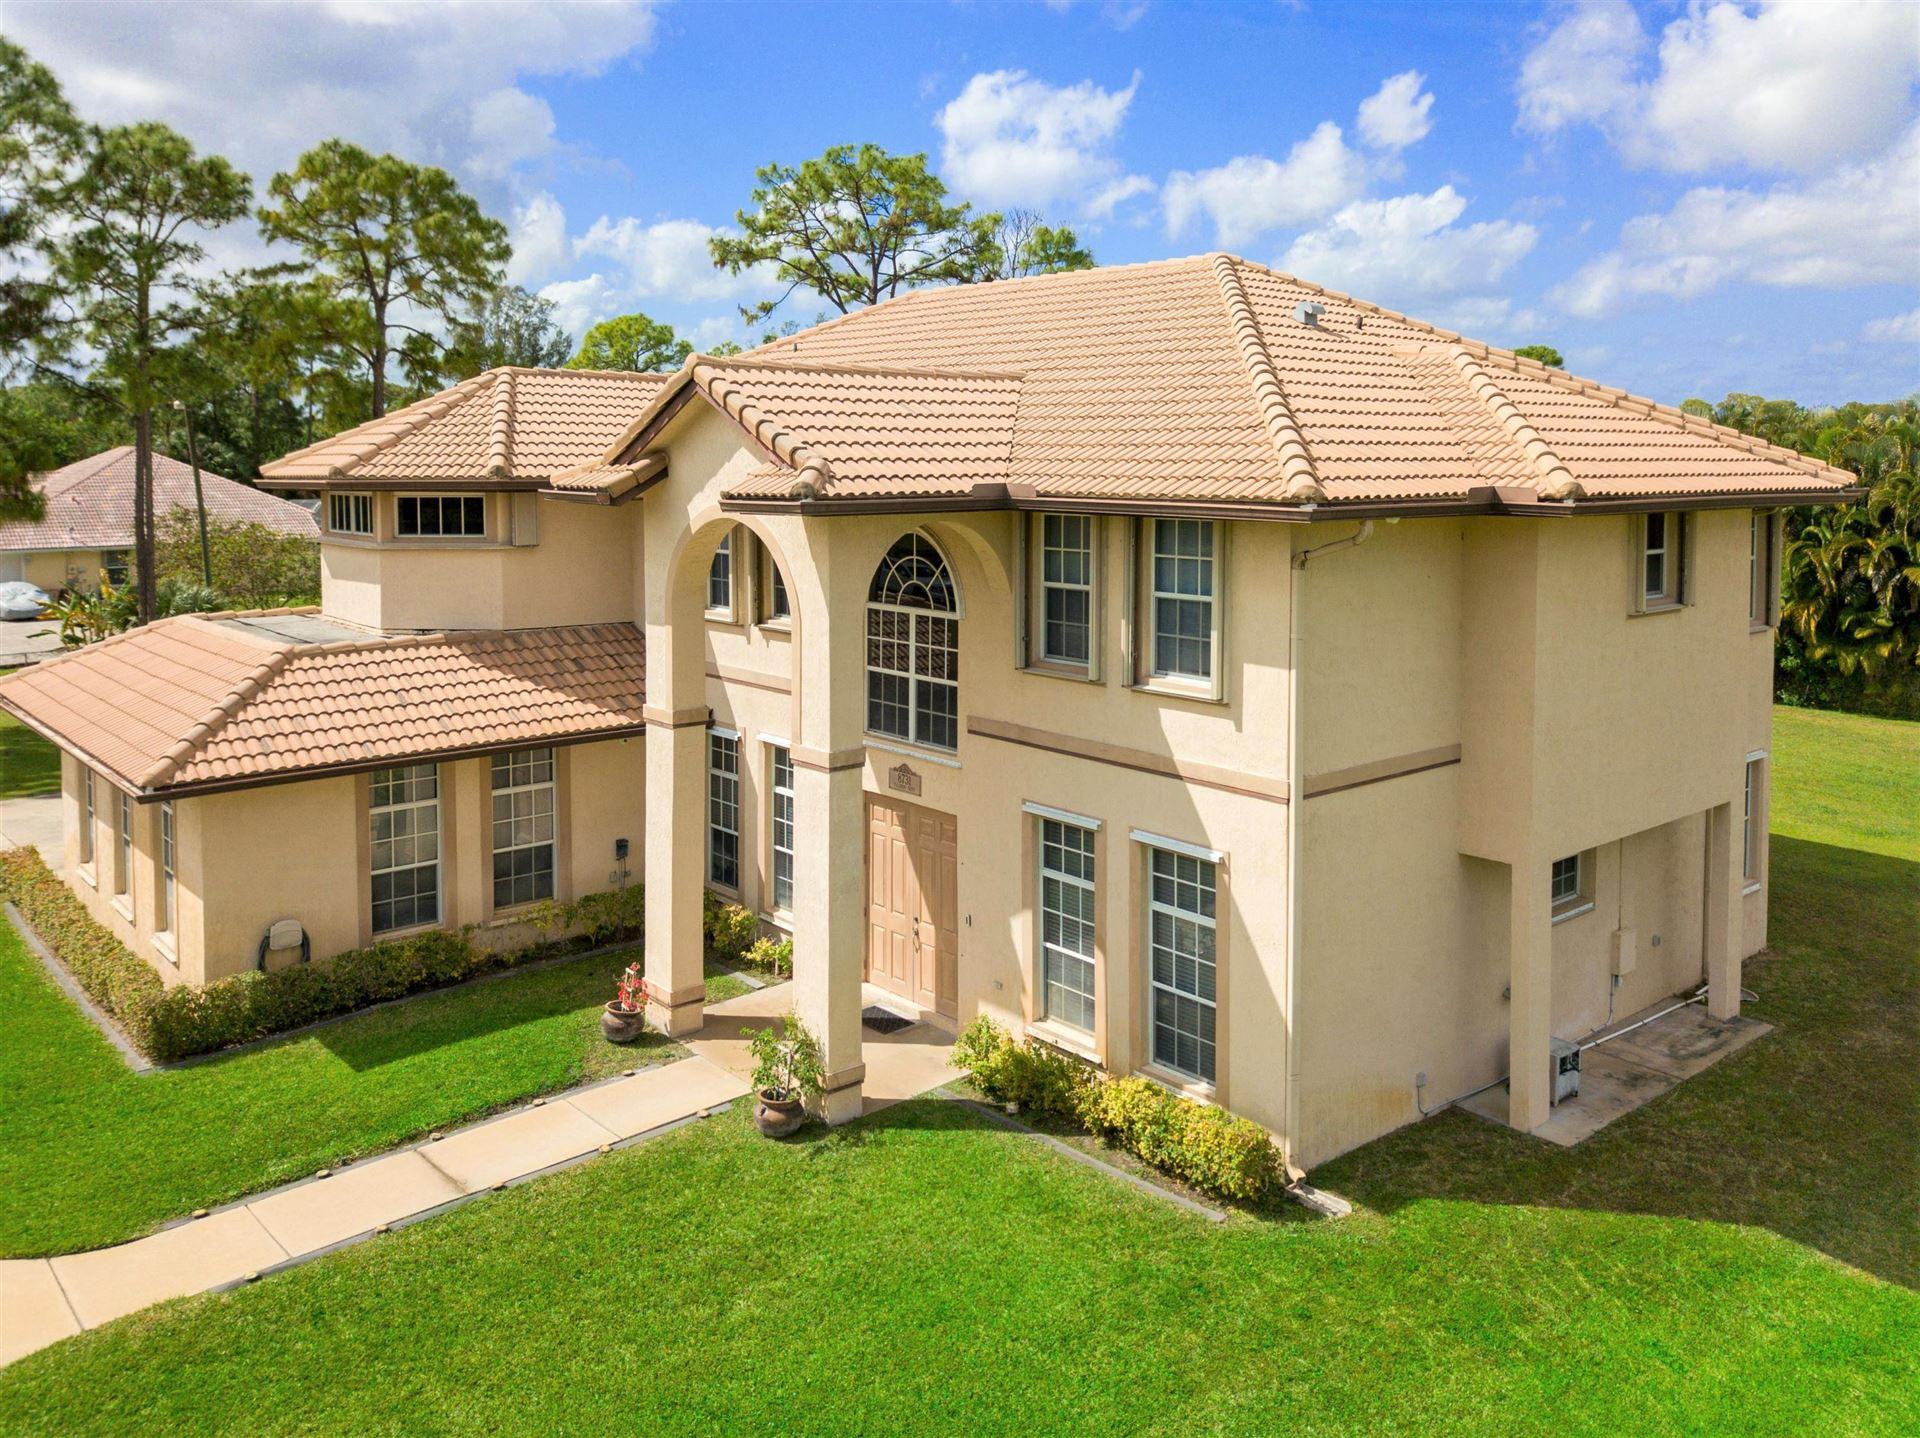 8731 Palomino Drive, Lake Worth, FL 33467 - #: RX-10607547